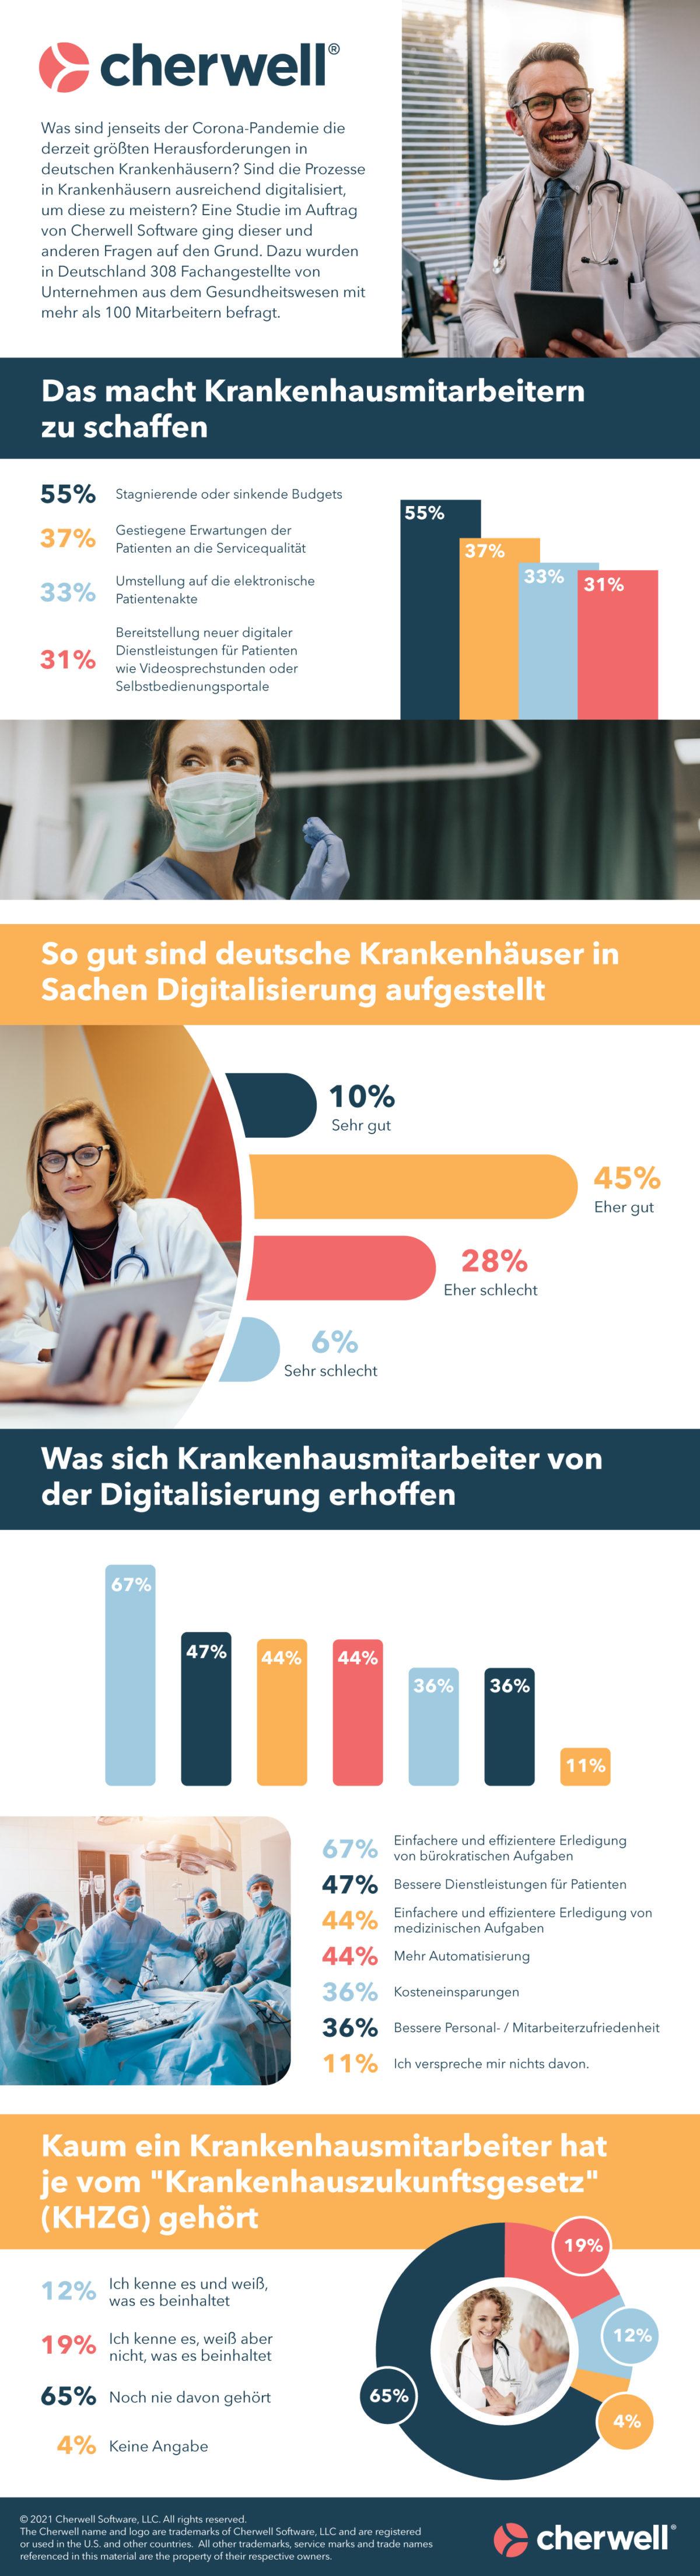 Healthcare-Survey-Infographic-(German)